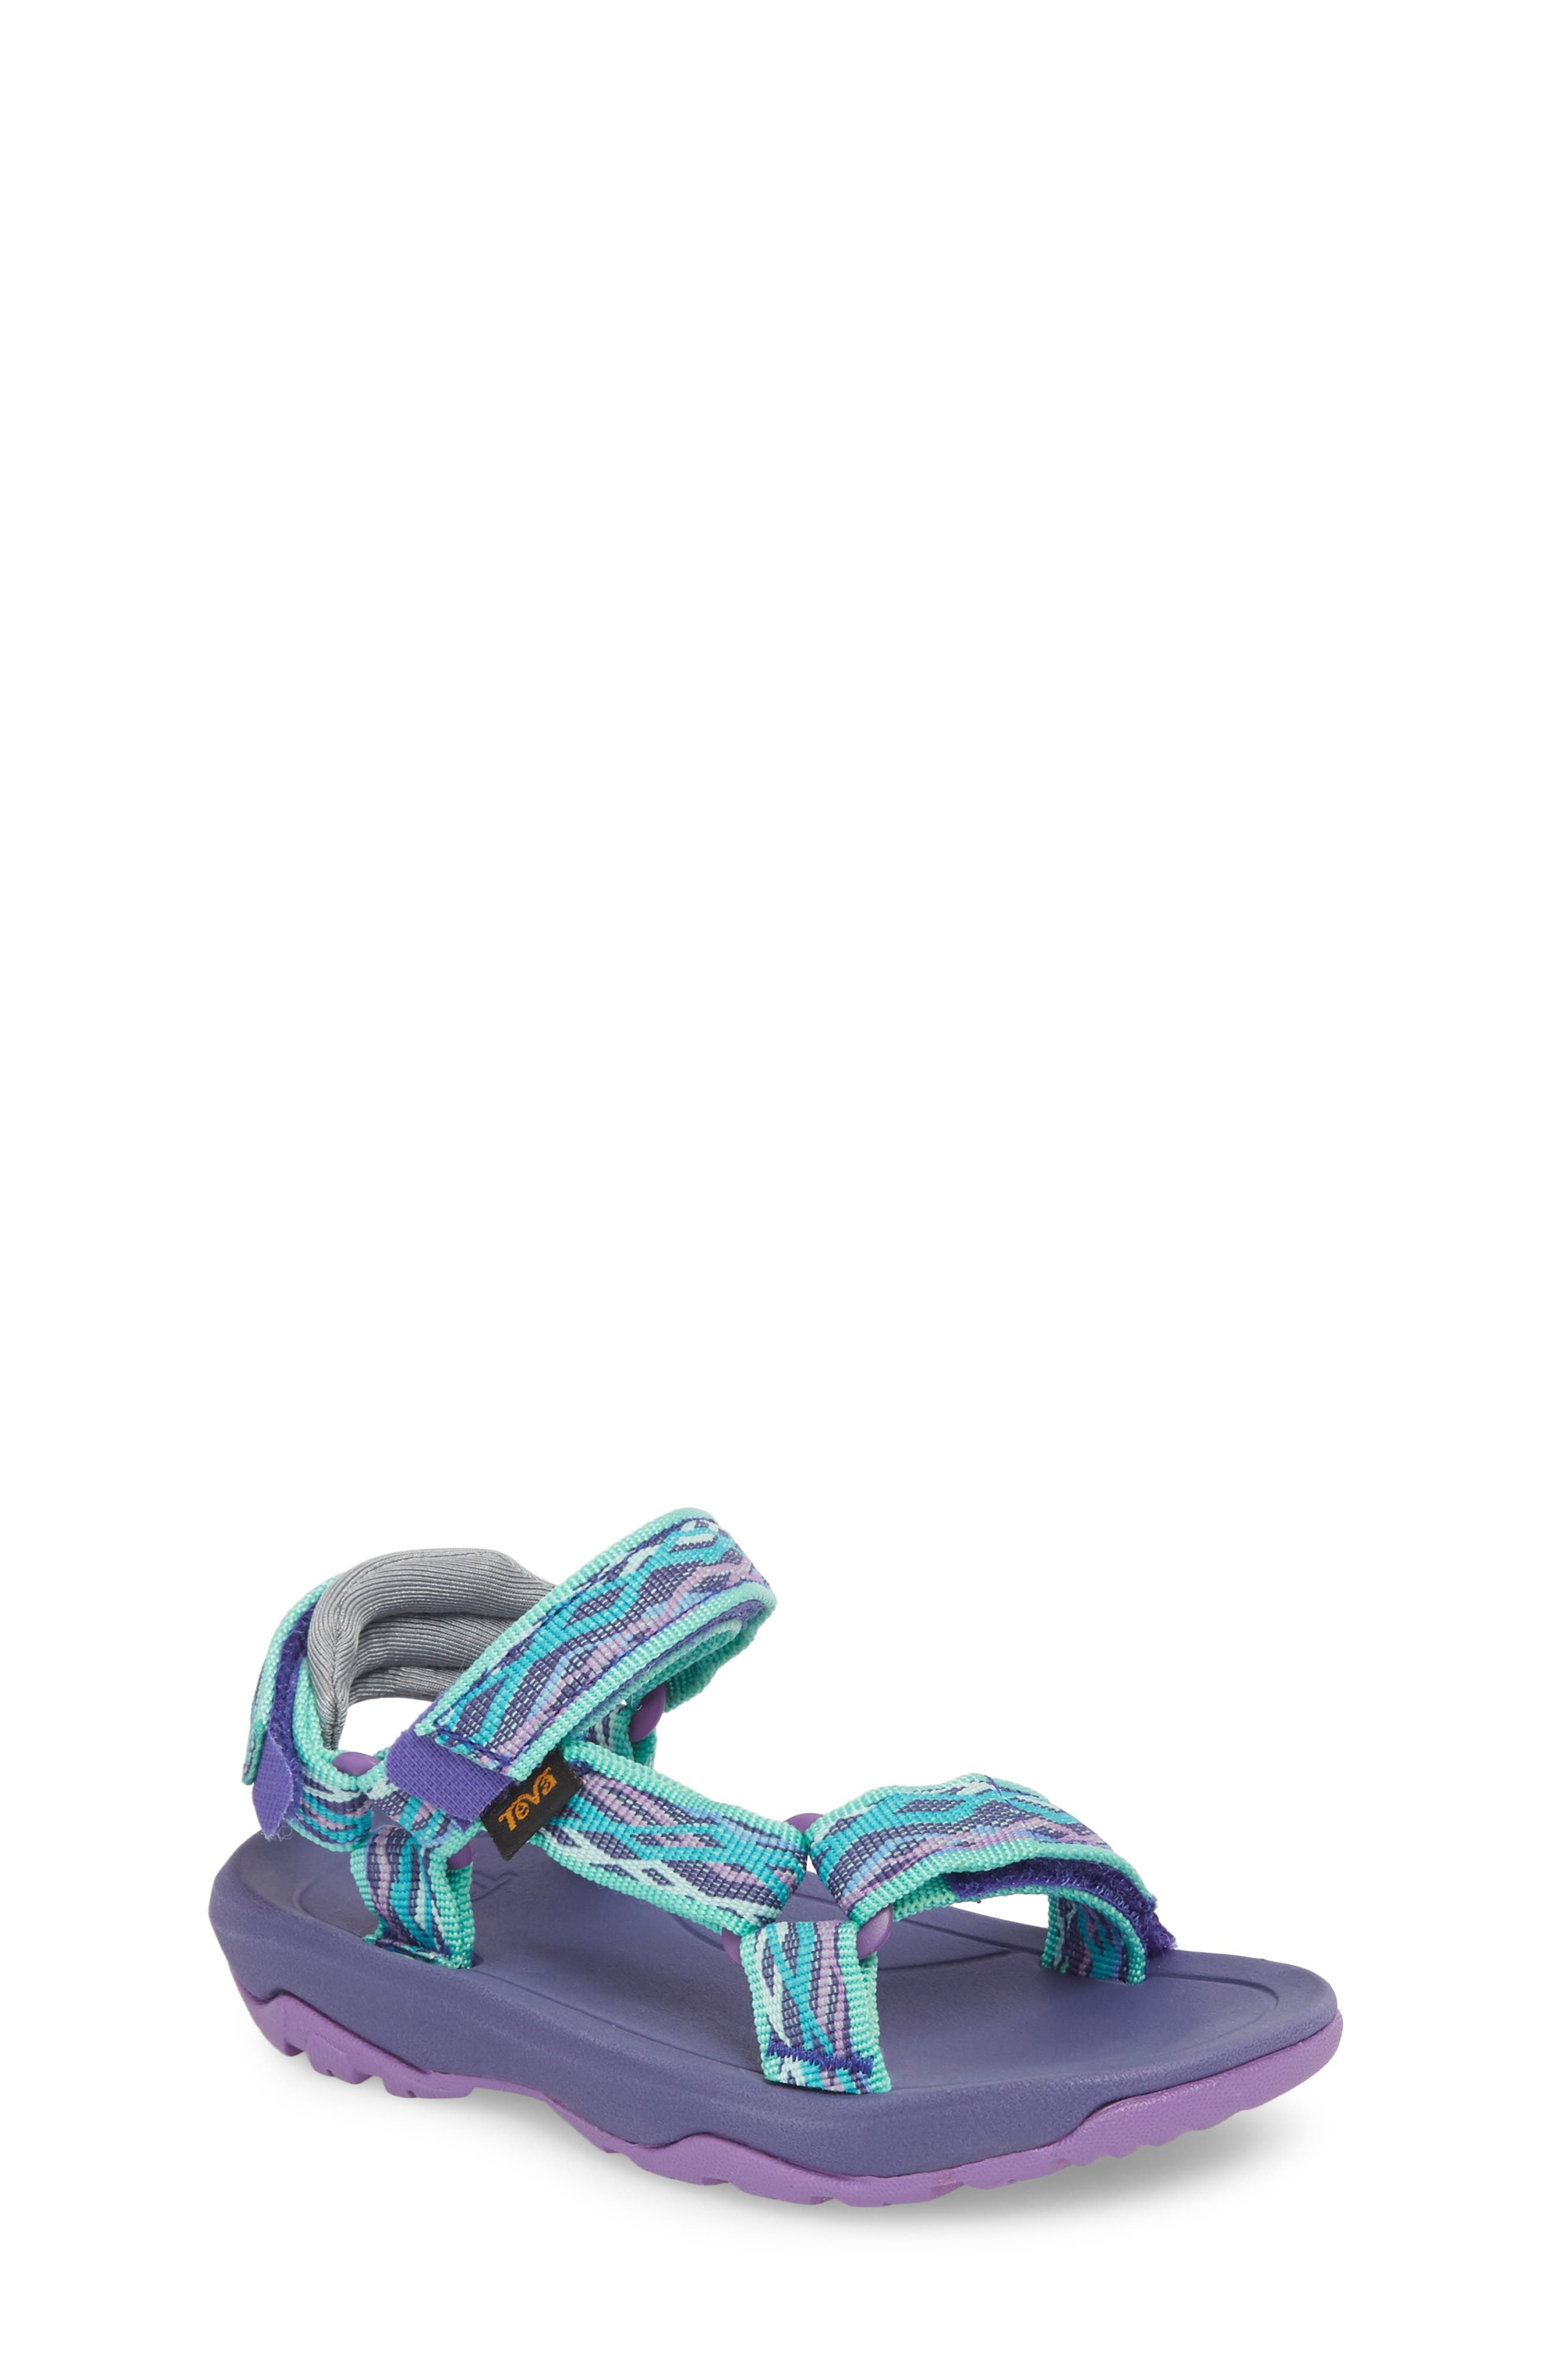 Hurricane XLT 2 Sandal,                             Main thumbnail 1, color,                             Delmar Sea Glass / Purple